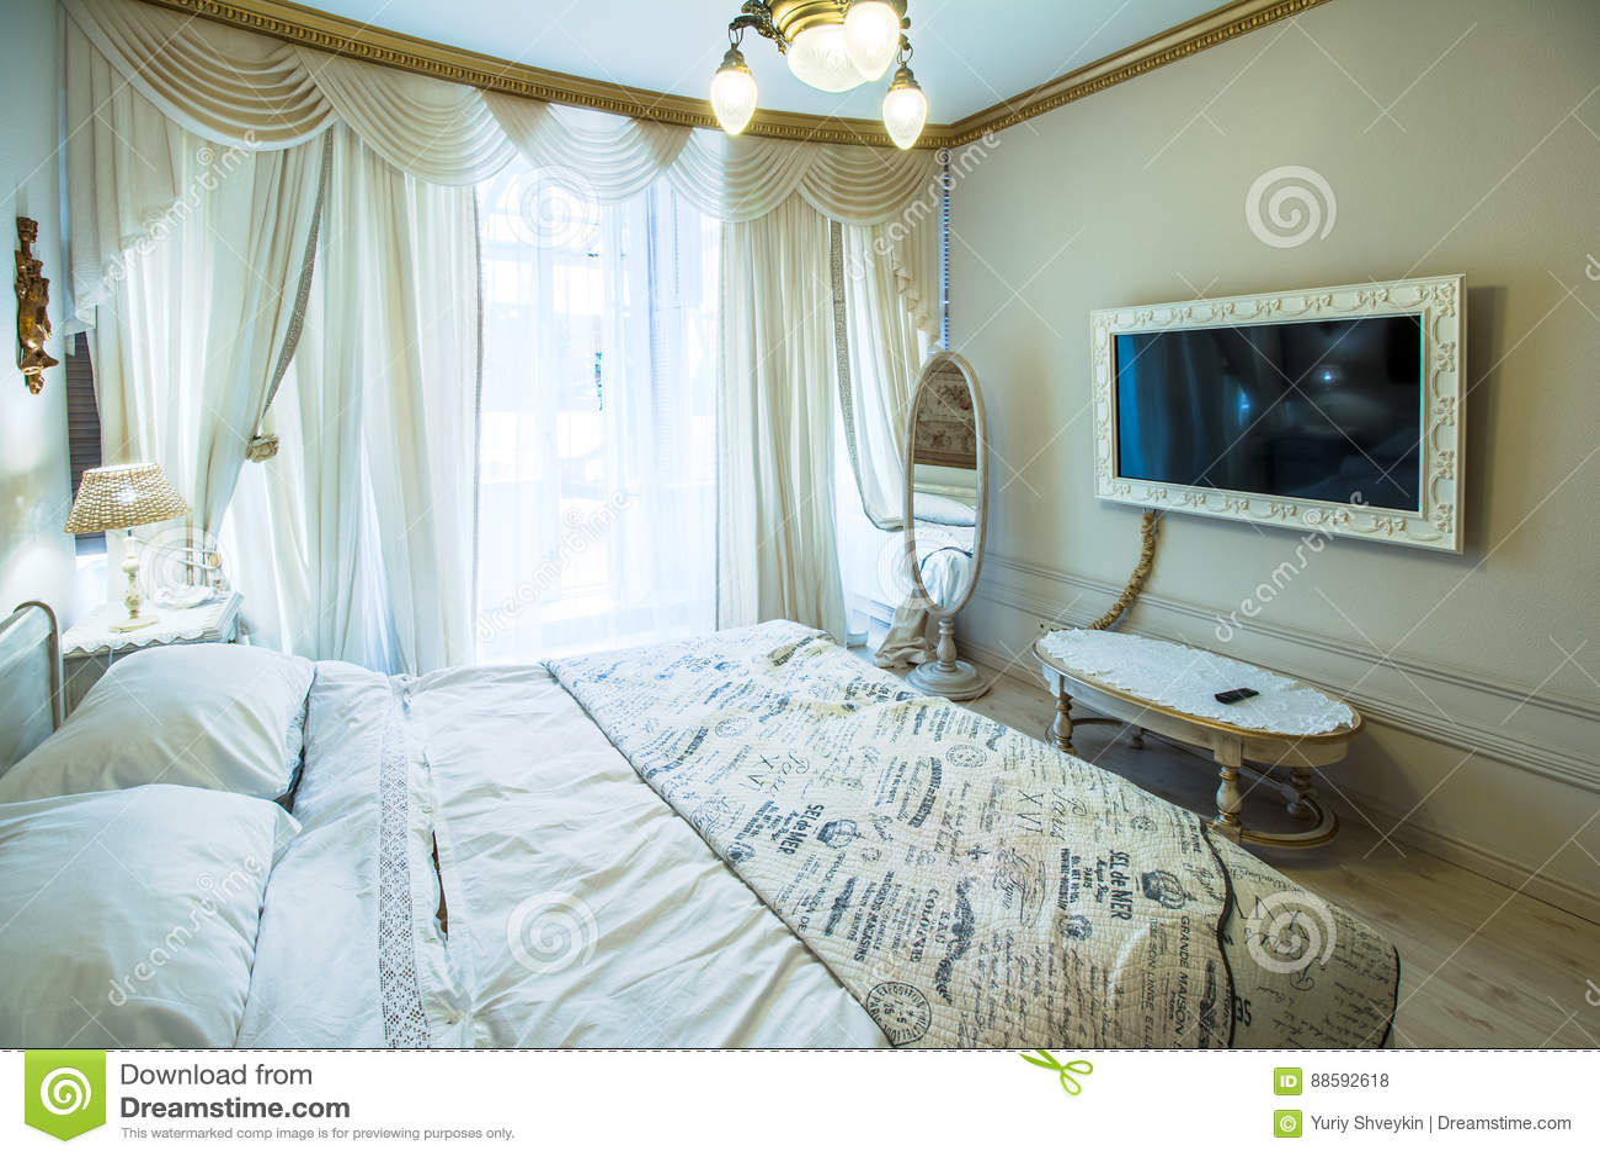 Grote en mooie slaapkamer stock foto. Afbeelding bestaande uit ...